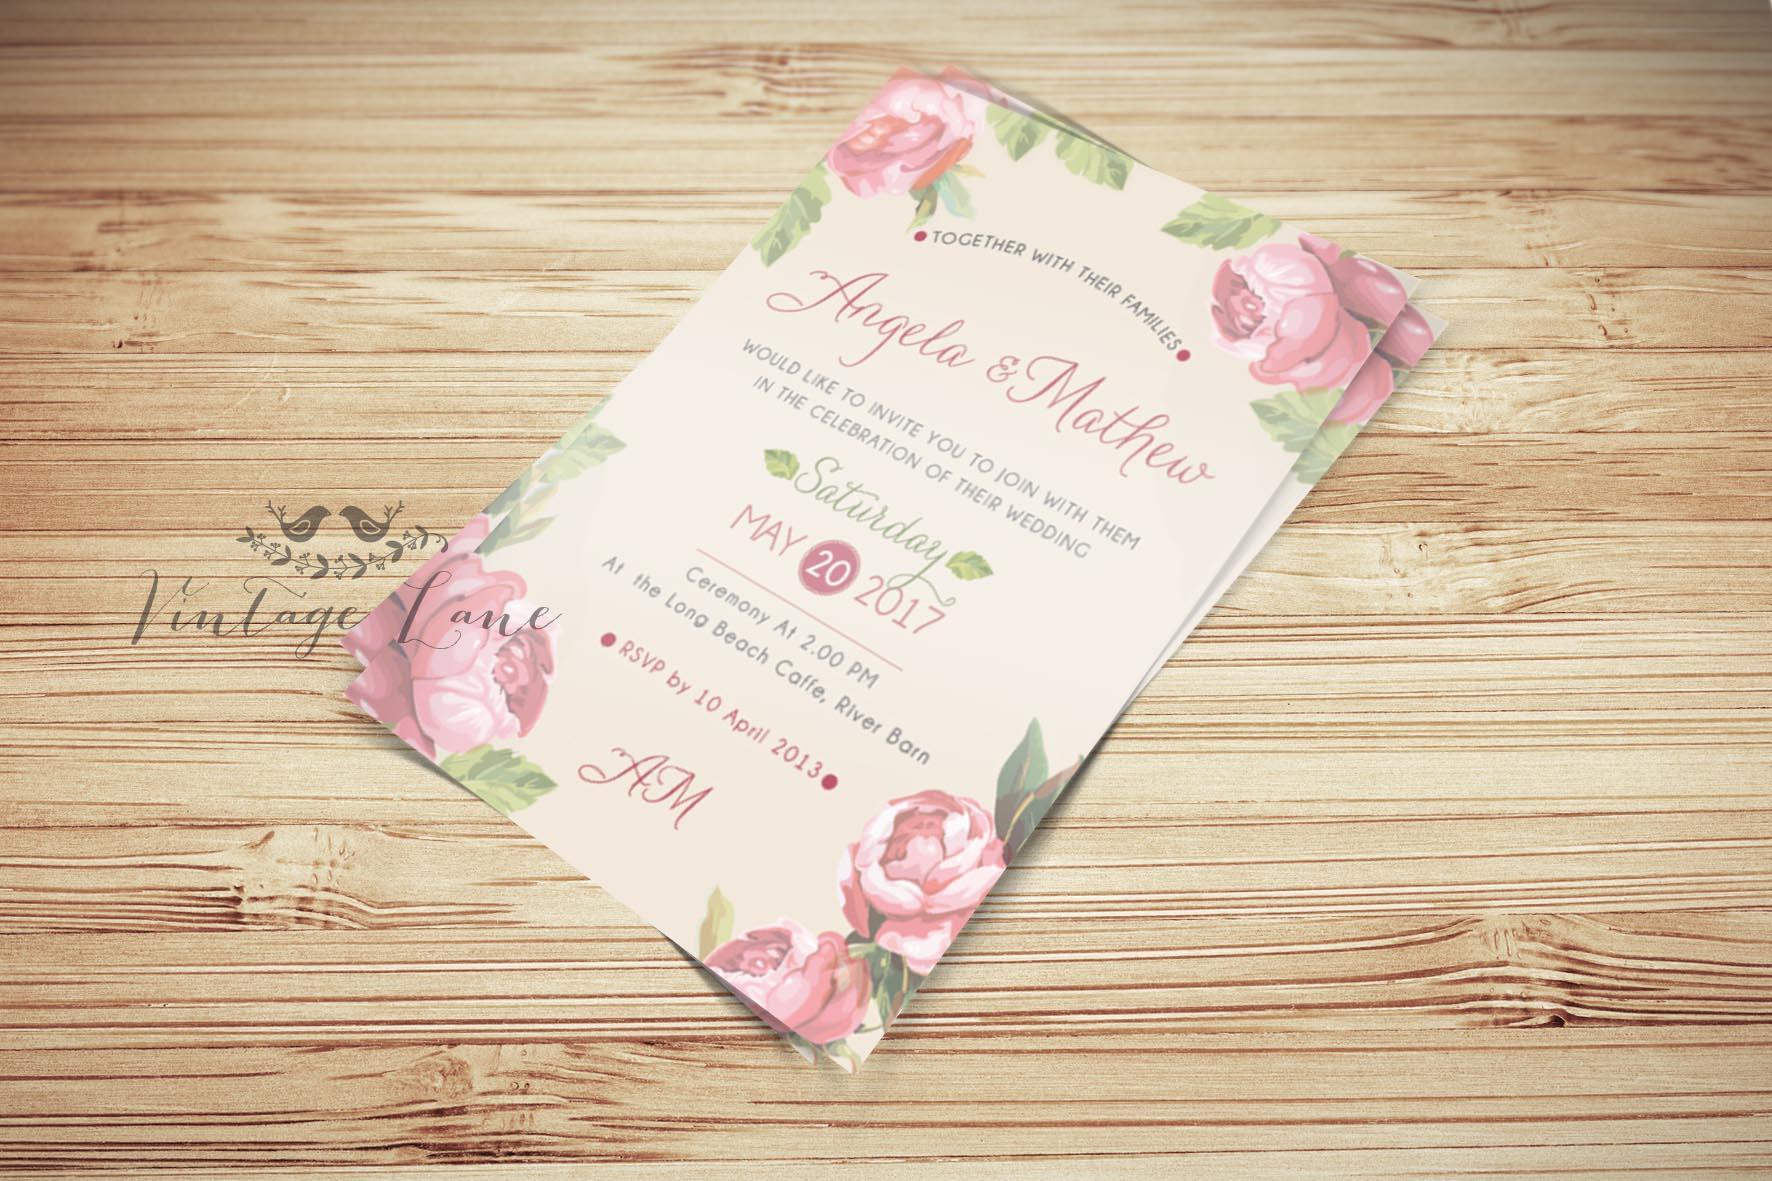 diy wedding invites ireland pink wedding invitations wedding evening invitations ireland diy white bifold